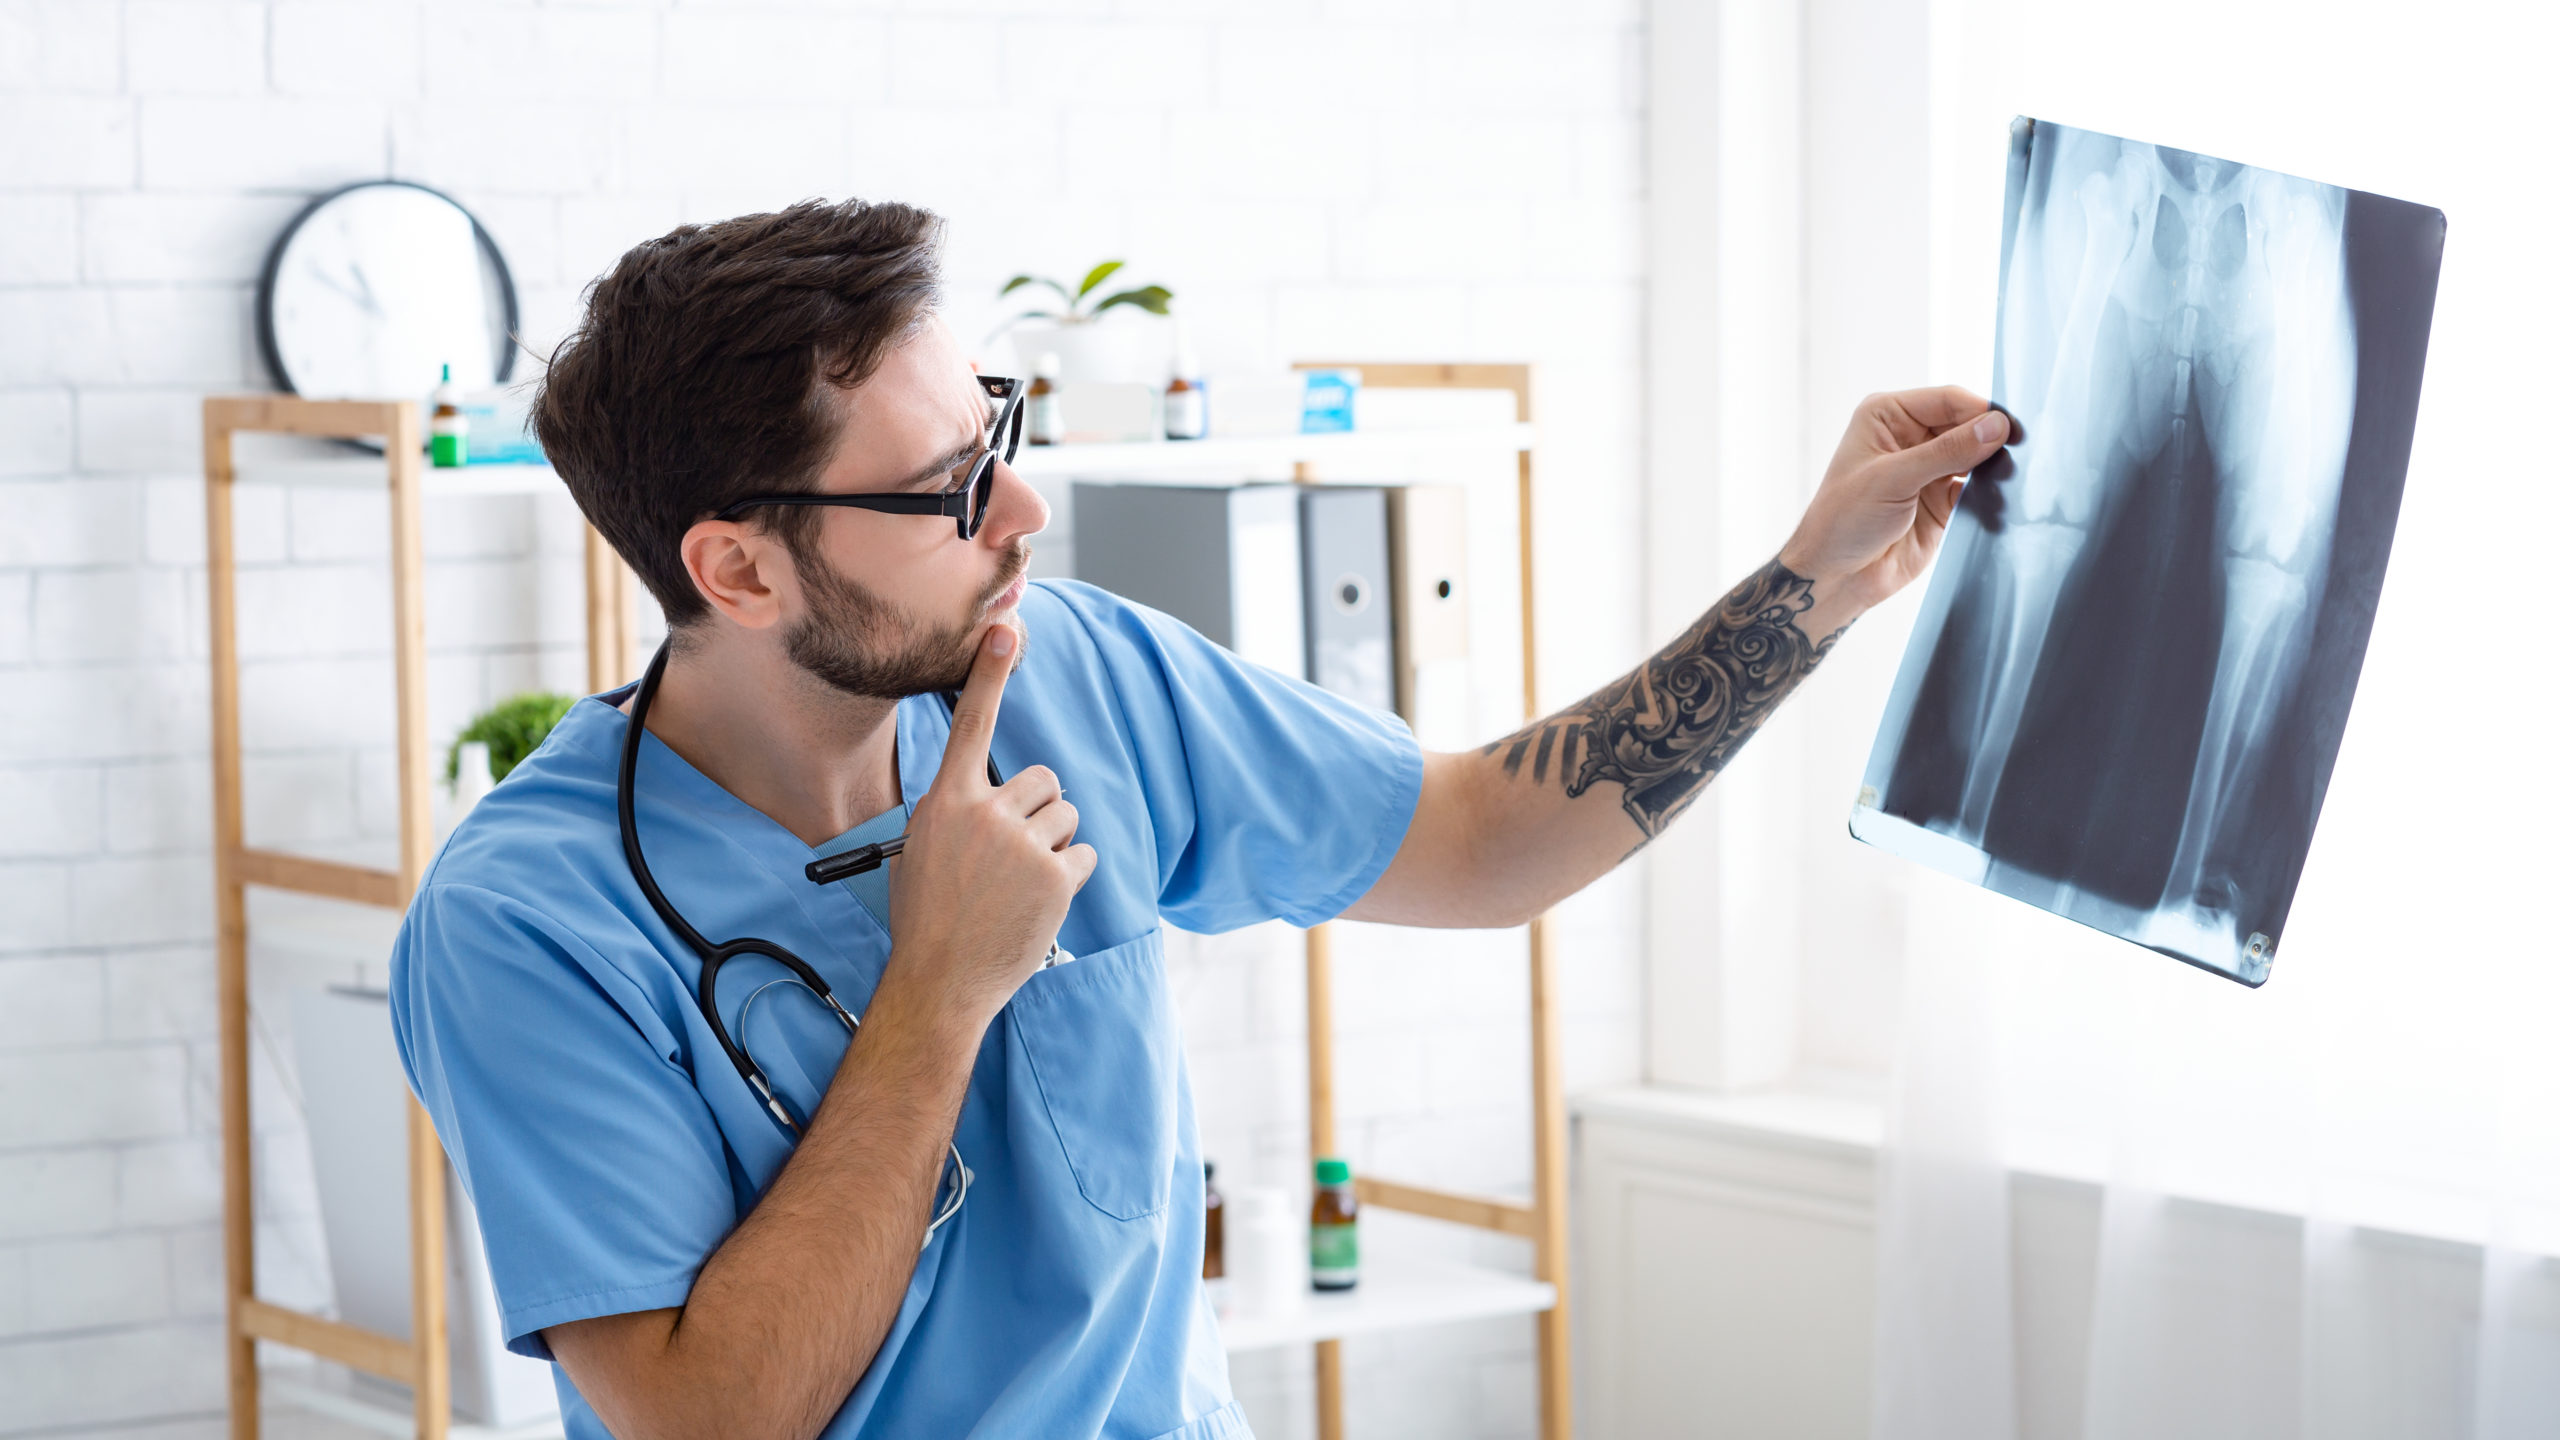 Male veterinary surgeon looking at xray at animal hospital, panorama